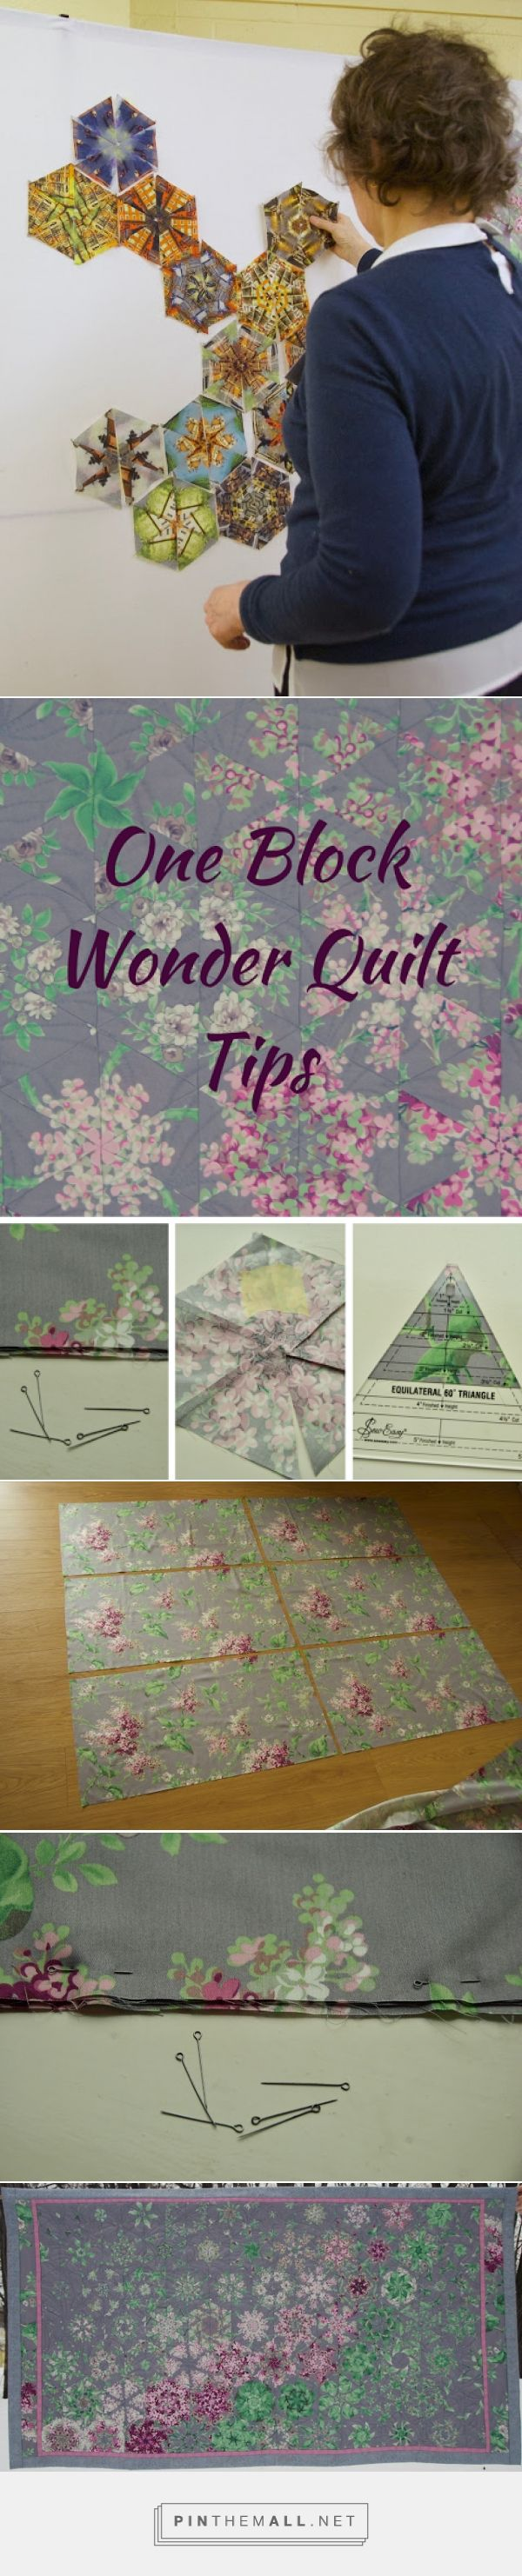 Quilt Art by Olena Pugachova: Tips Taken Away from ... One Block Wonder Workshop - created via https://pinthemall.net